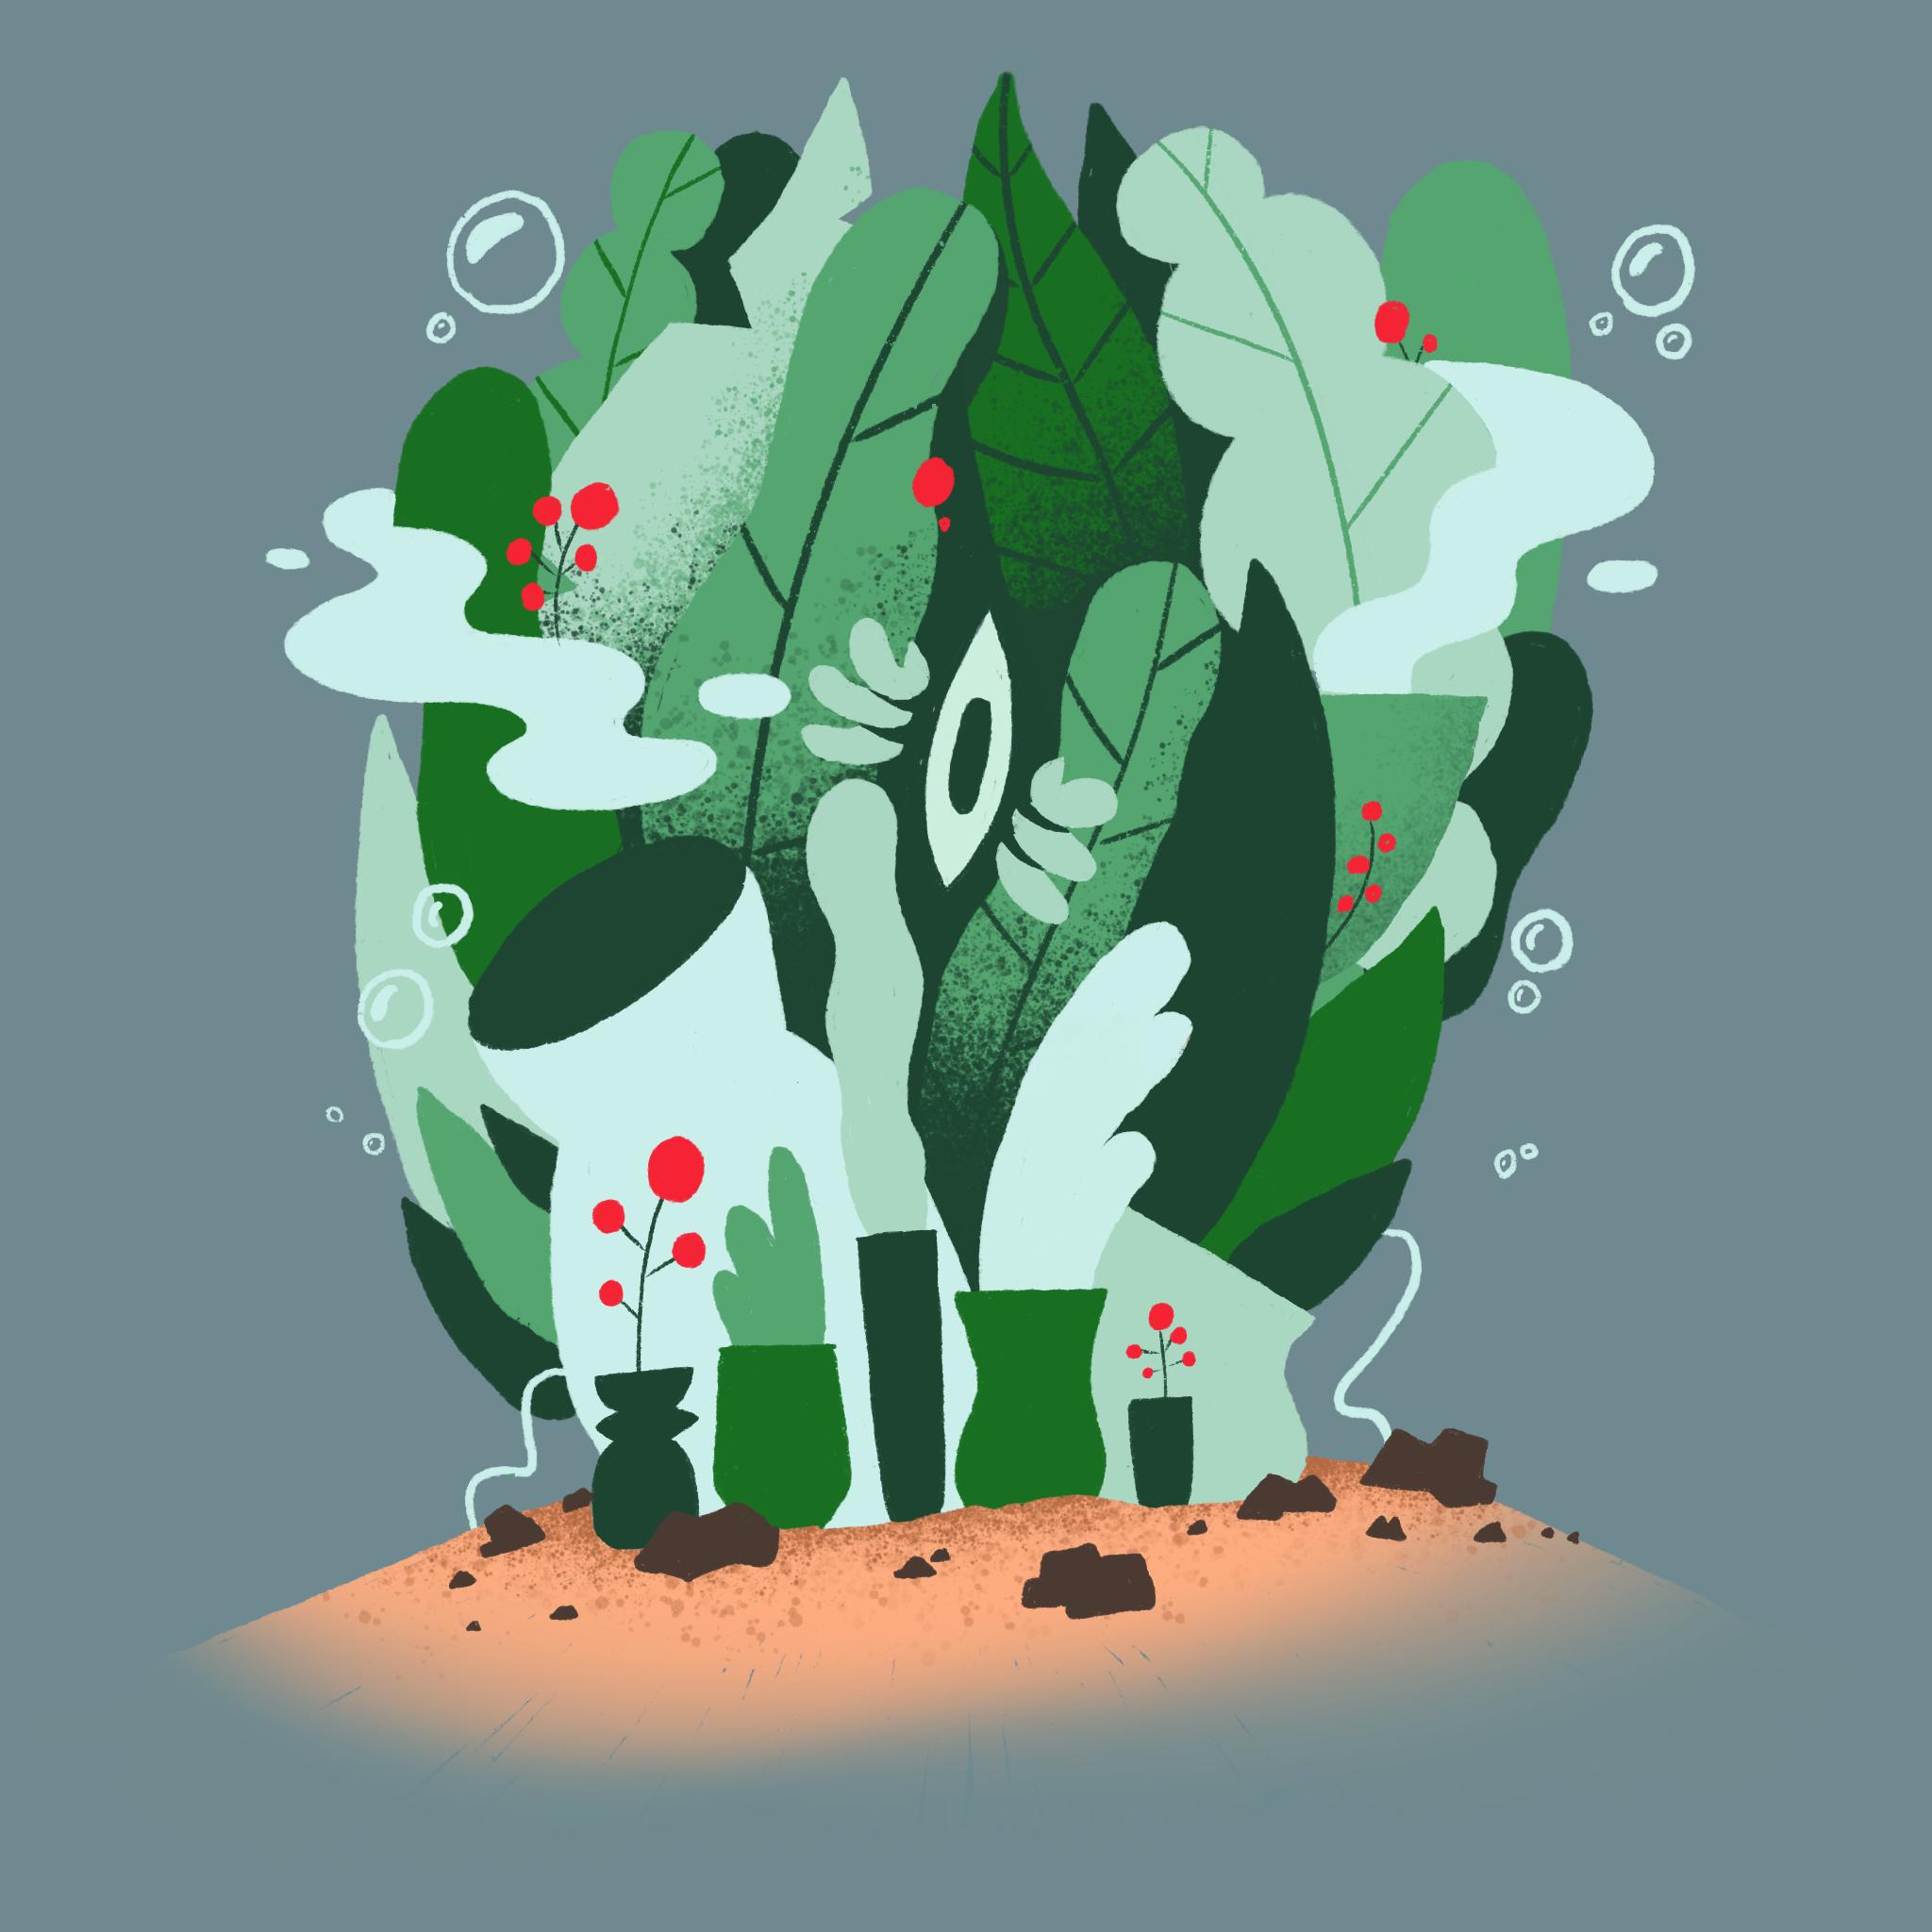 plants-06.png